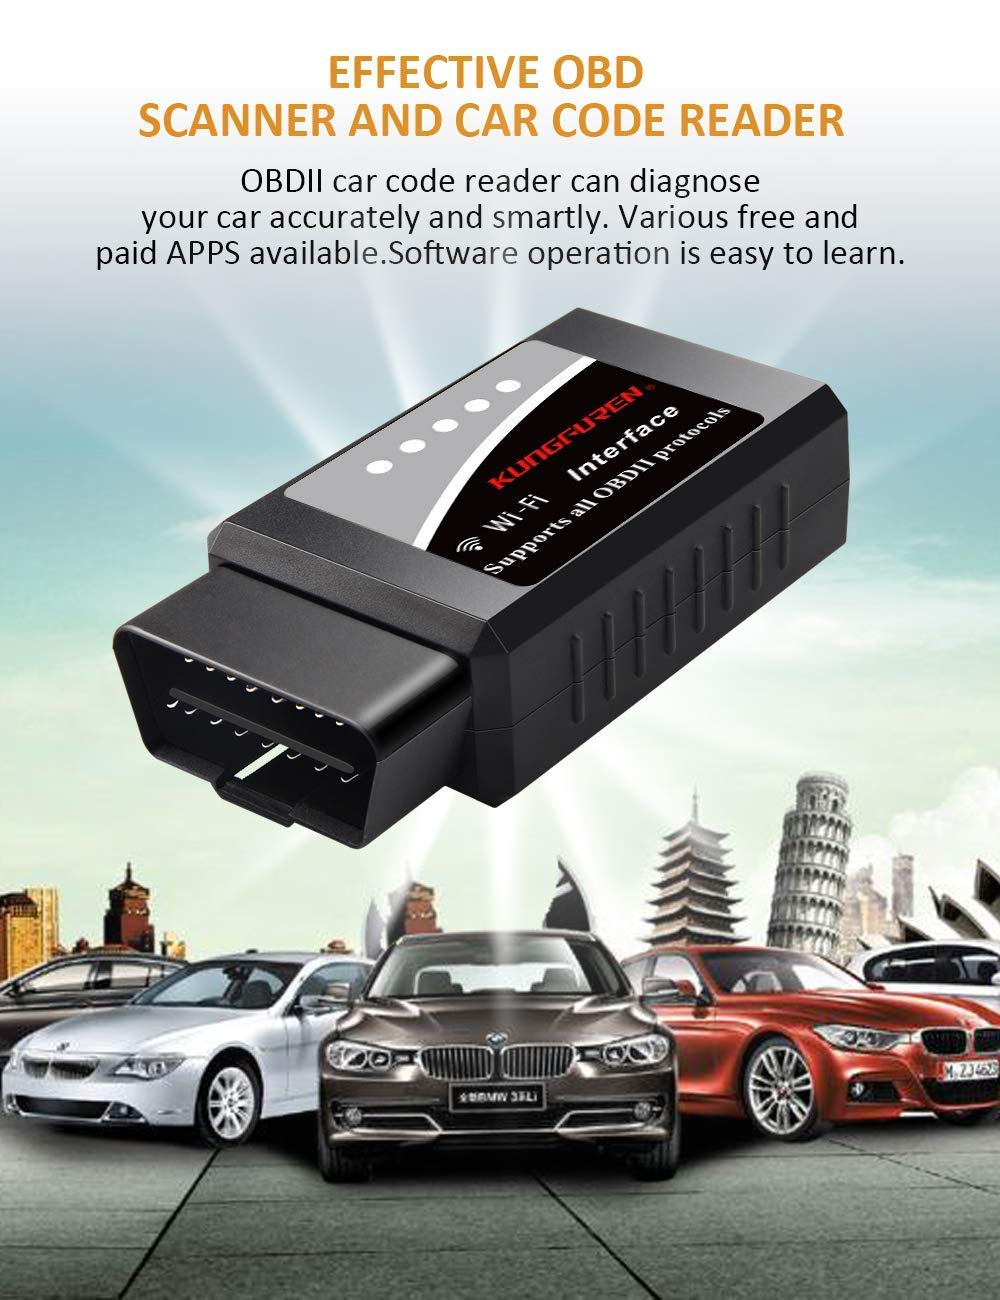 kungfuren OBD2 Bluetooth Scanner OBD 2 Reader Car OBD Diagnostic Scanner Fault Code OBD ii OBD-ii Reader Tool Compatible with Android /& Windows Devices